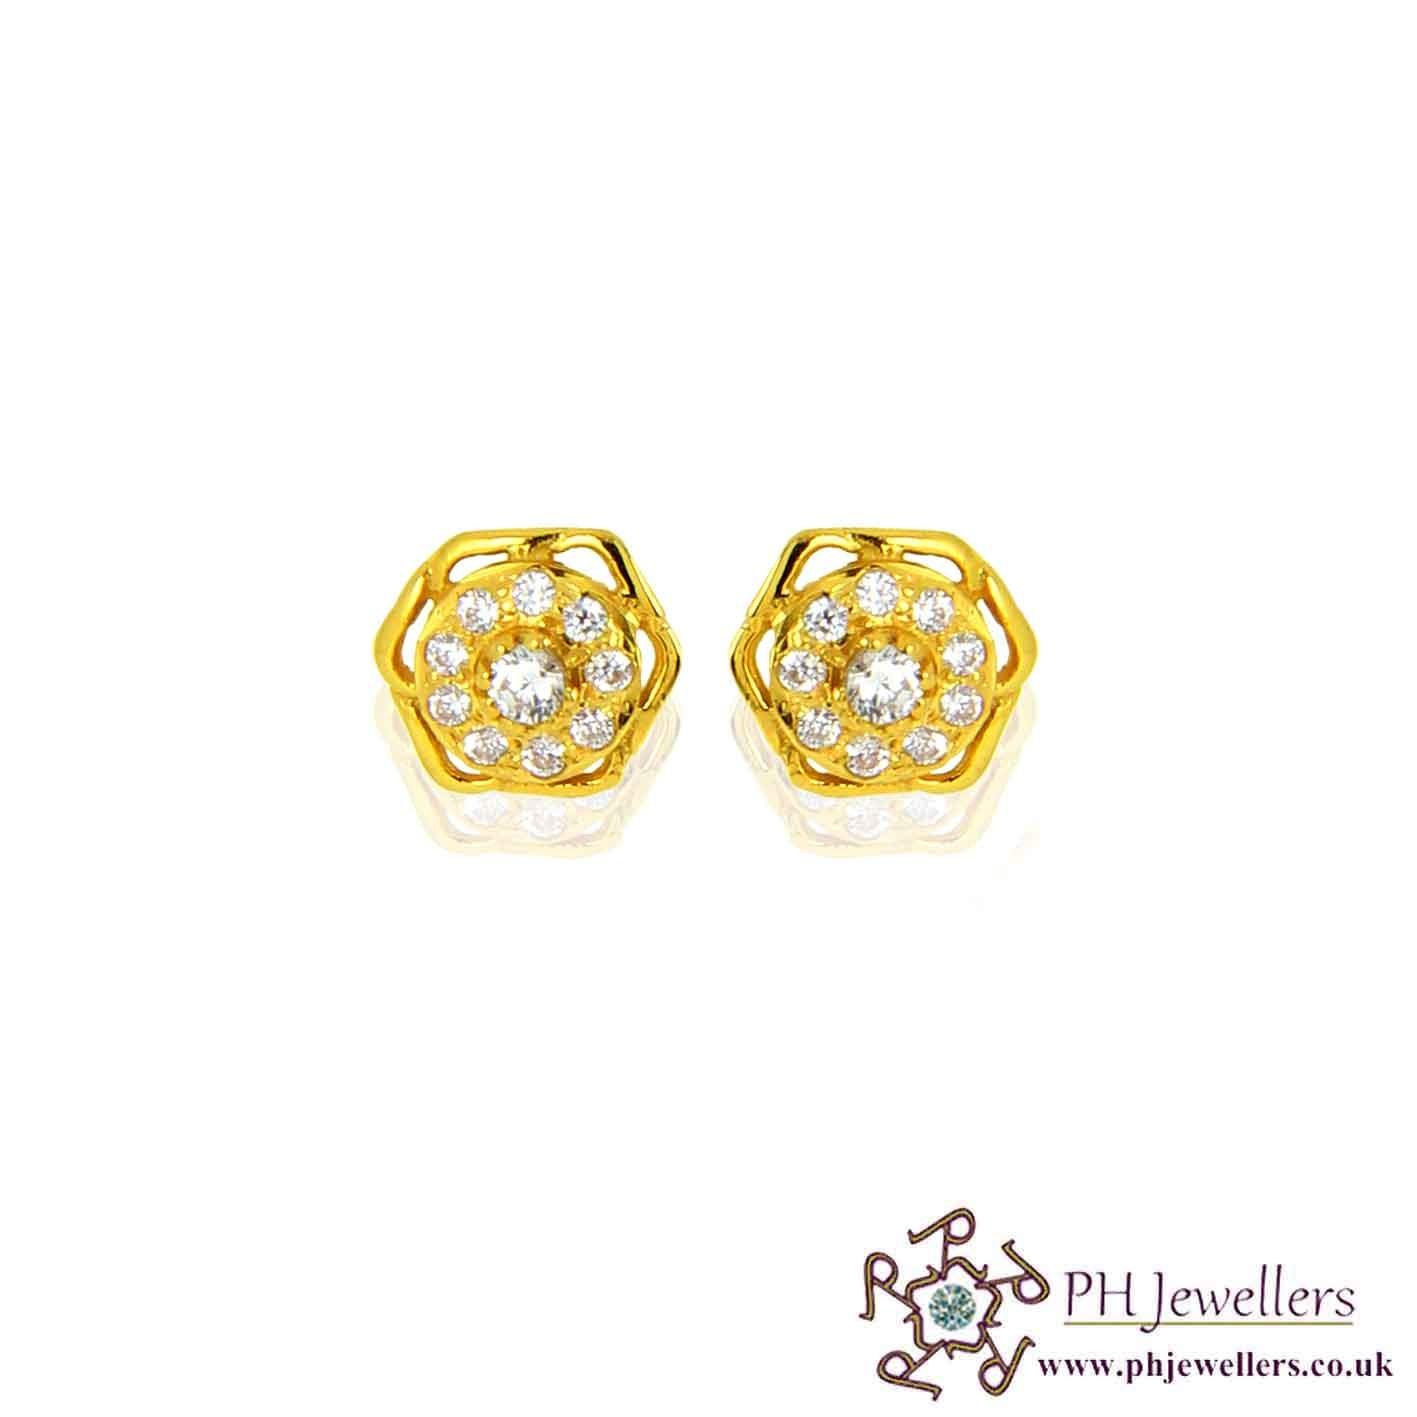 22ct 916 Yellow Gold Earring CZ SE52